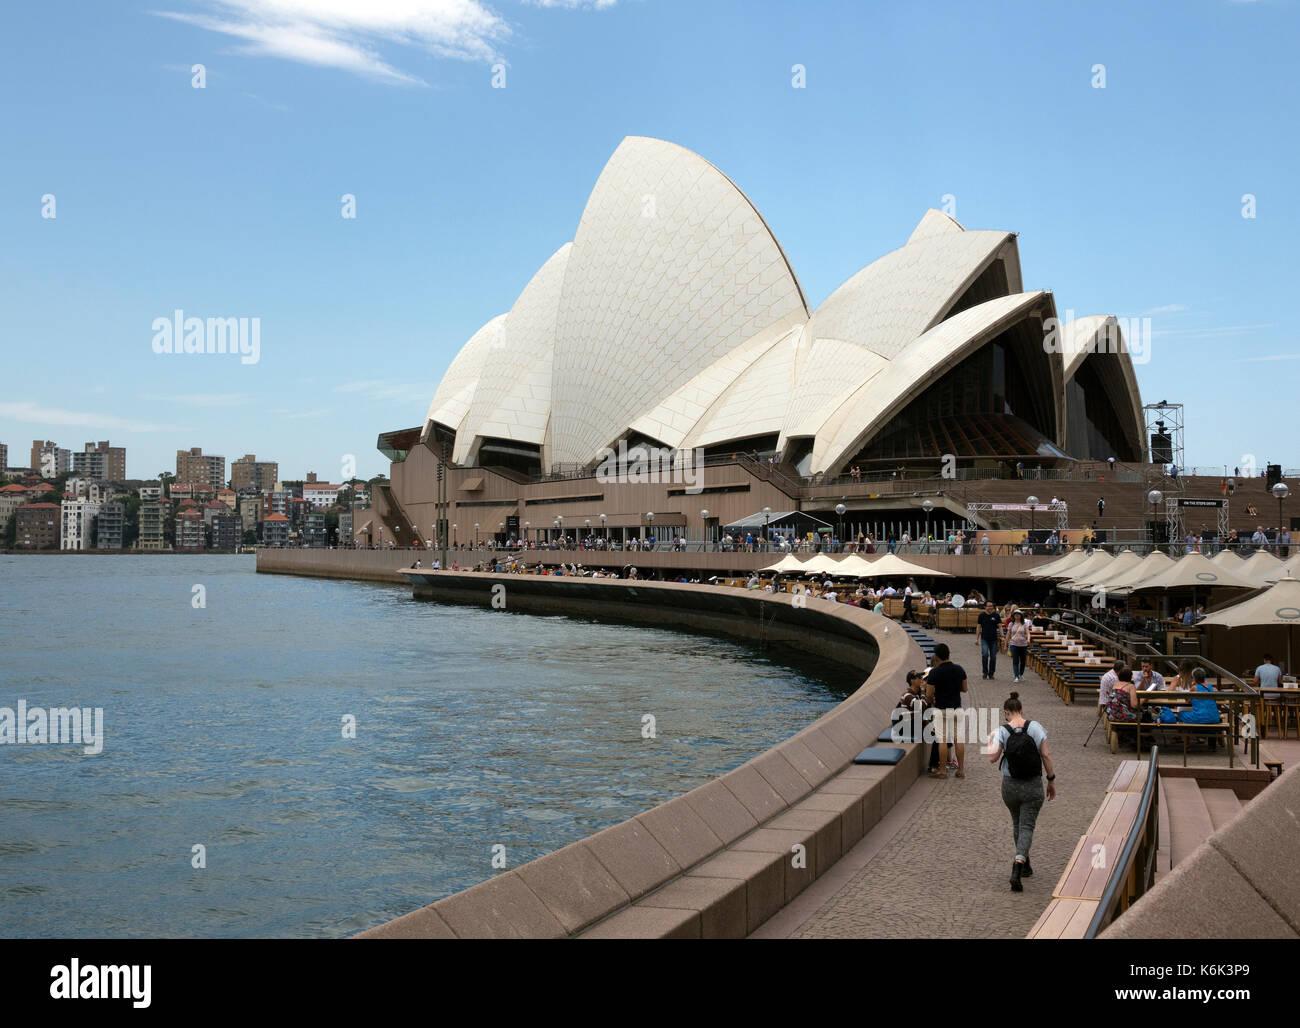 Waterfront Pavement From Circular Quay To Sydney Opera House An Iconic Australian Symbol Landmark Sydney Harbour Australia - Stock Image